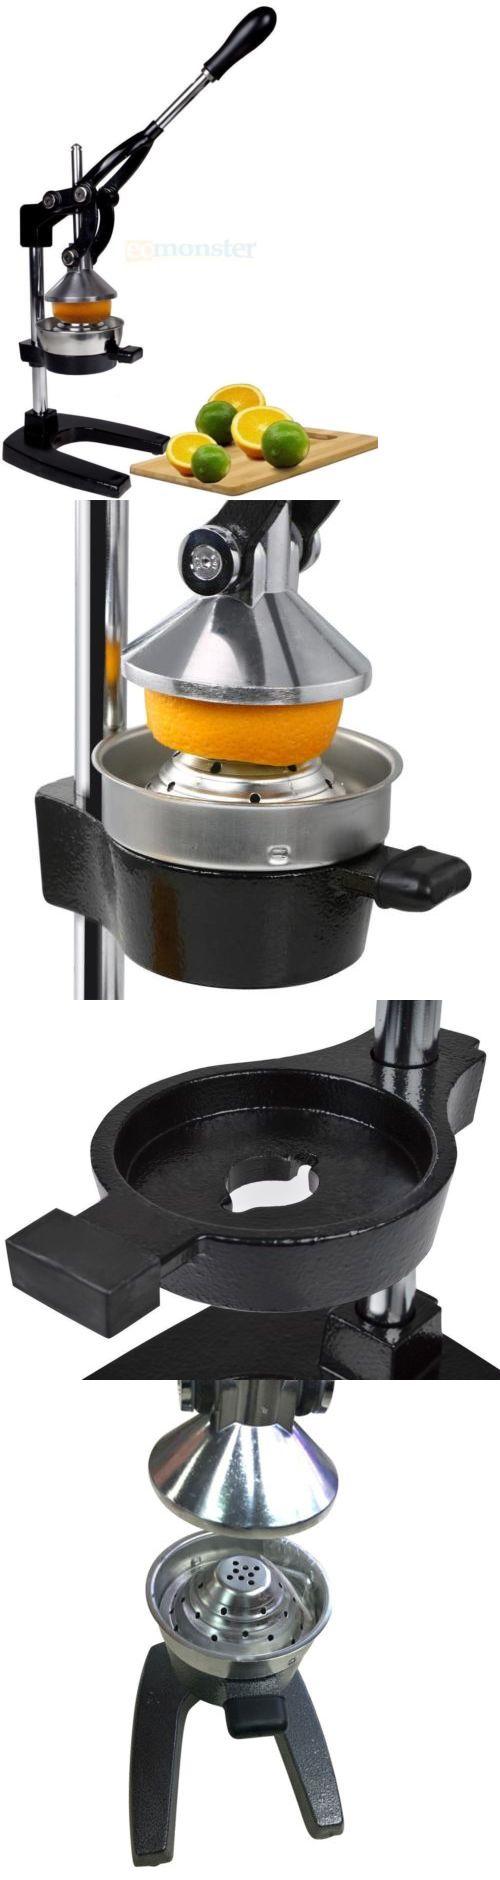 Small Kitchen Appliances: New Orange Hand Press Manual Fruit Juicer Juice Squeezer Citrus Orange Lemon BUY IT NOW ONLY: $35.89